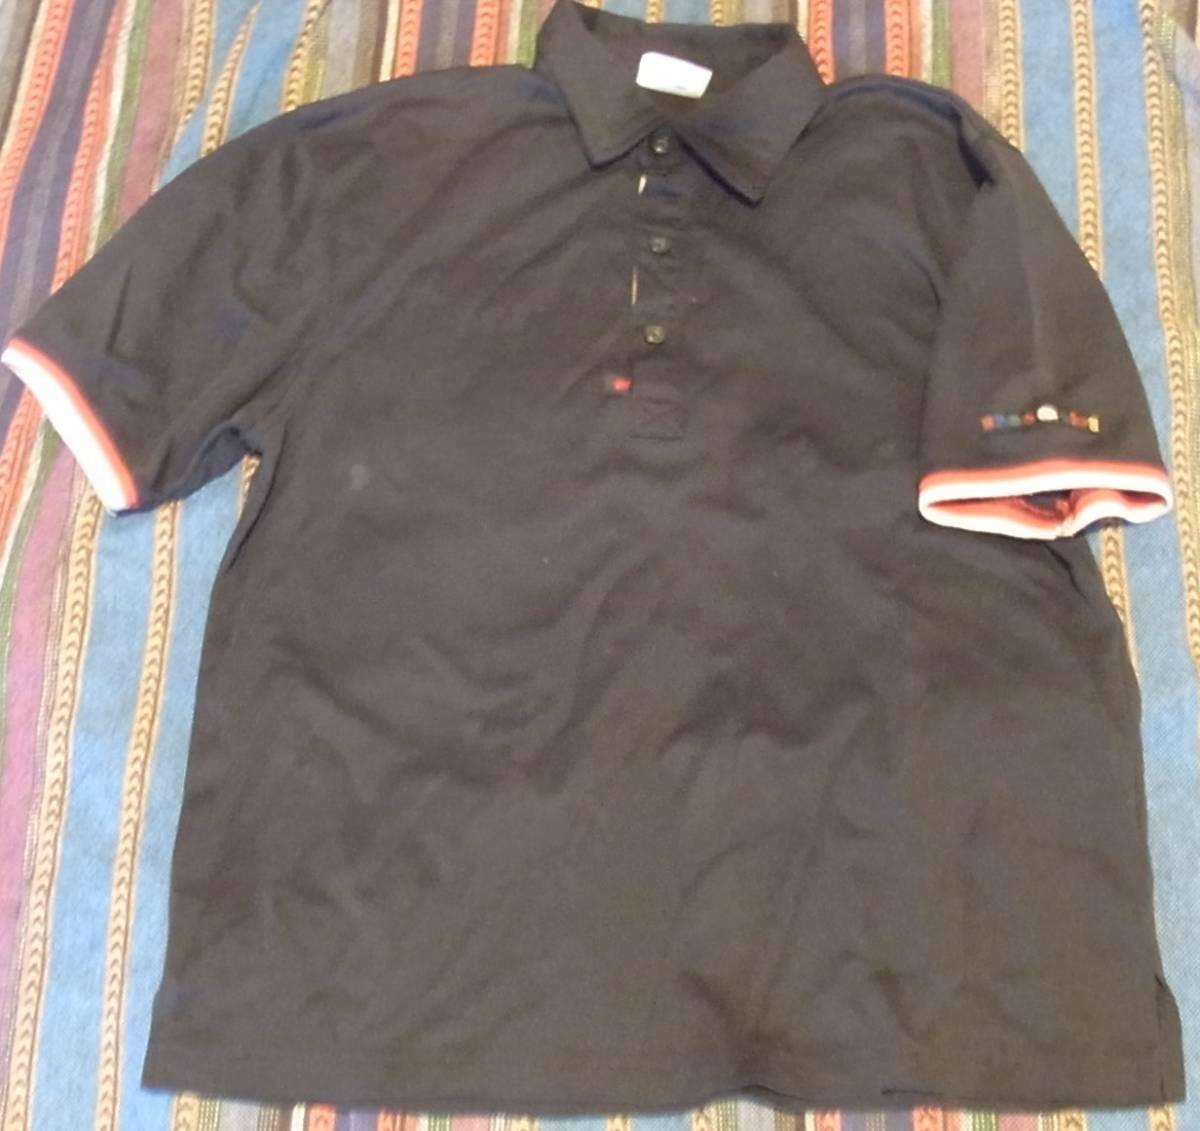 d22ed13f1e247 burger king Burger King uniform uniform short sleeves shirt on sea.  inscription equipped abroad